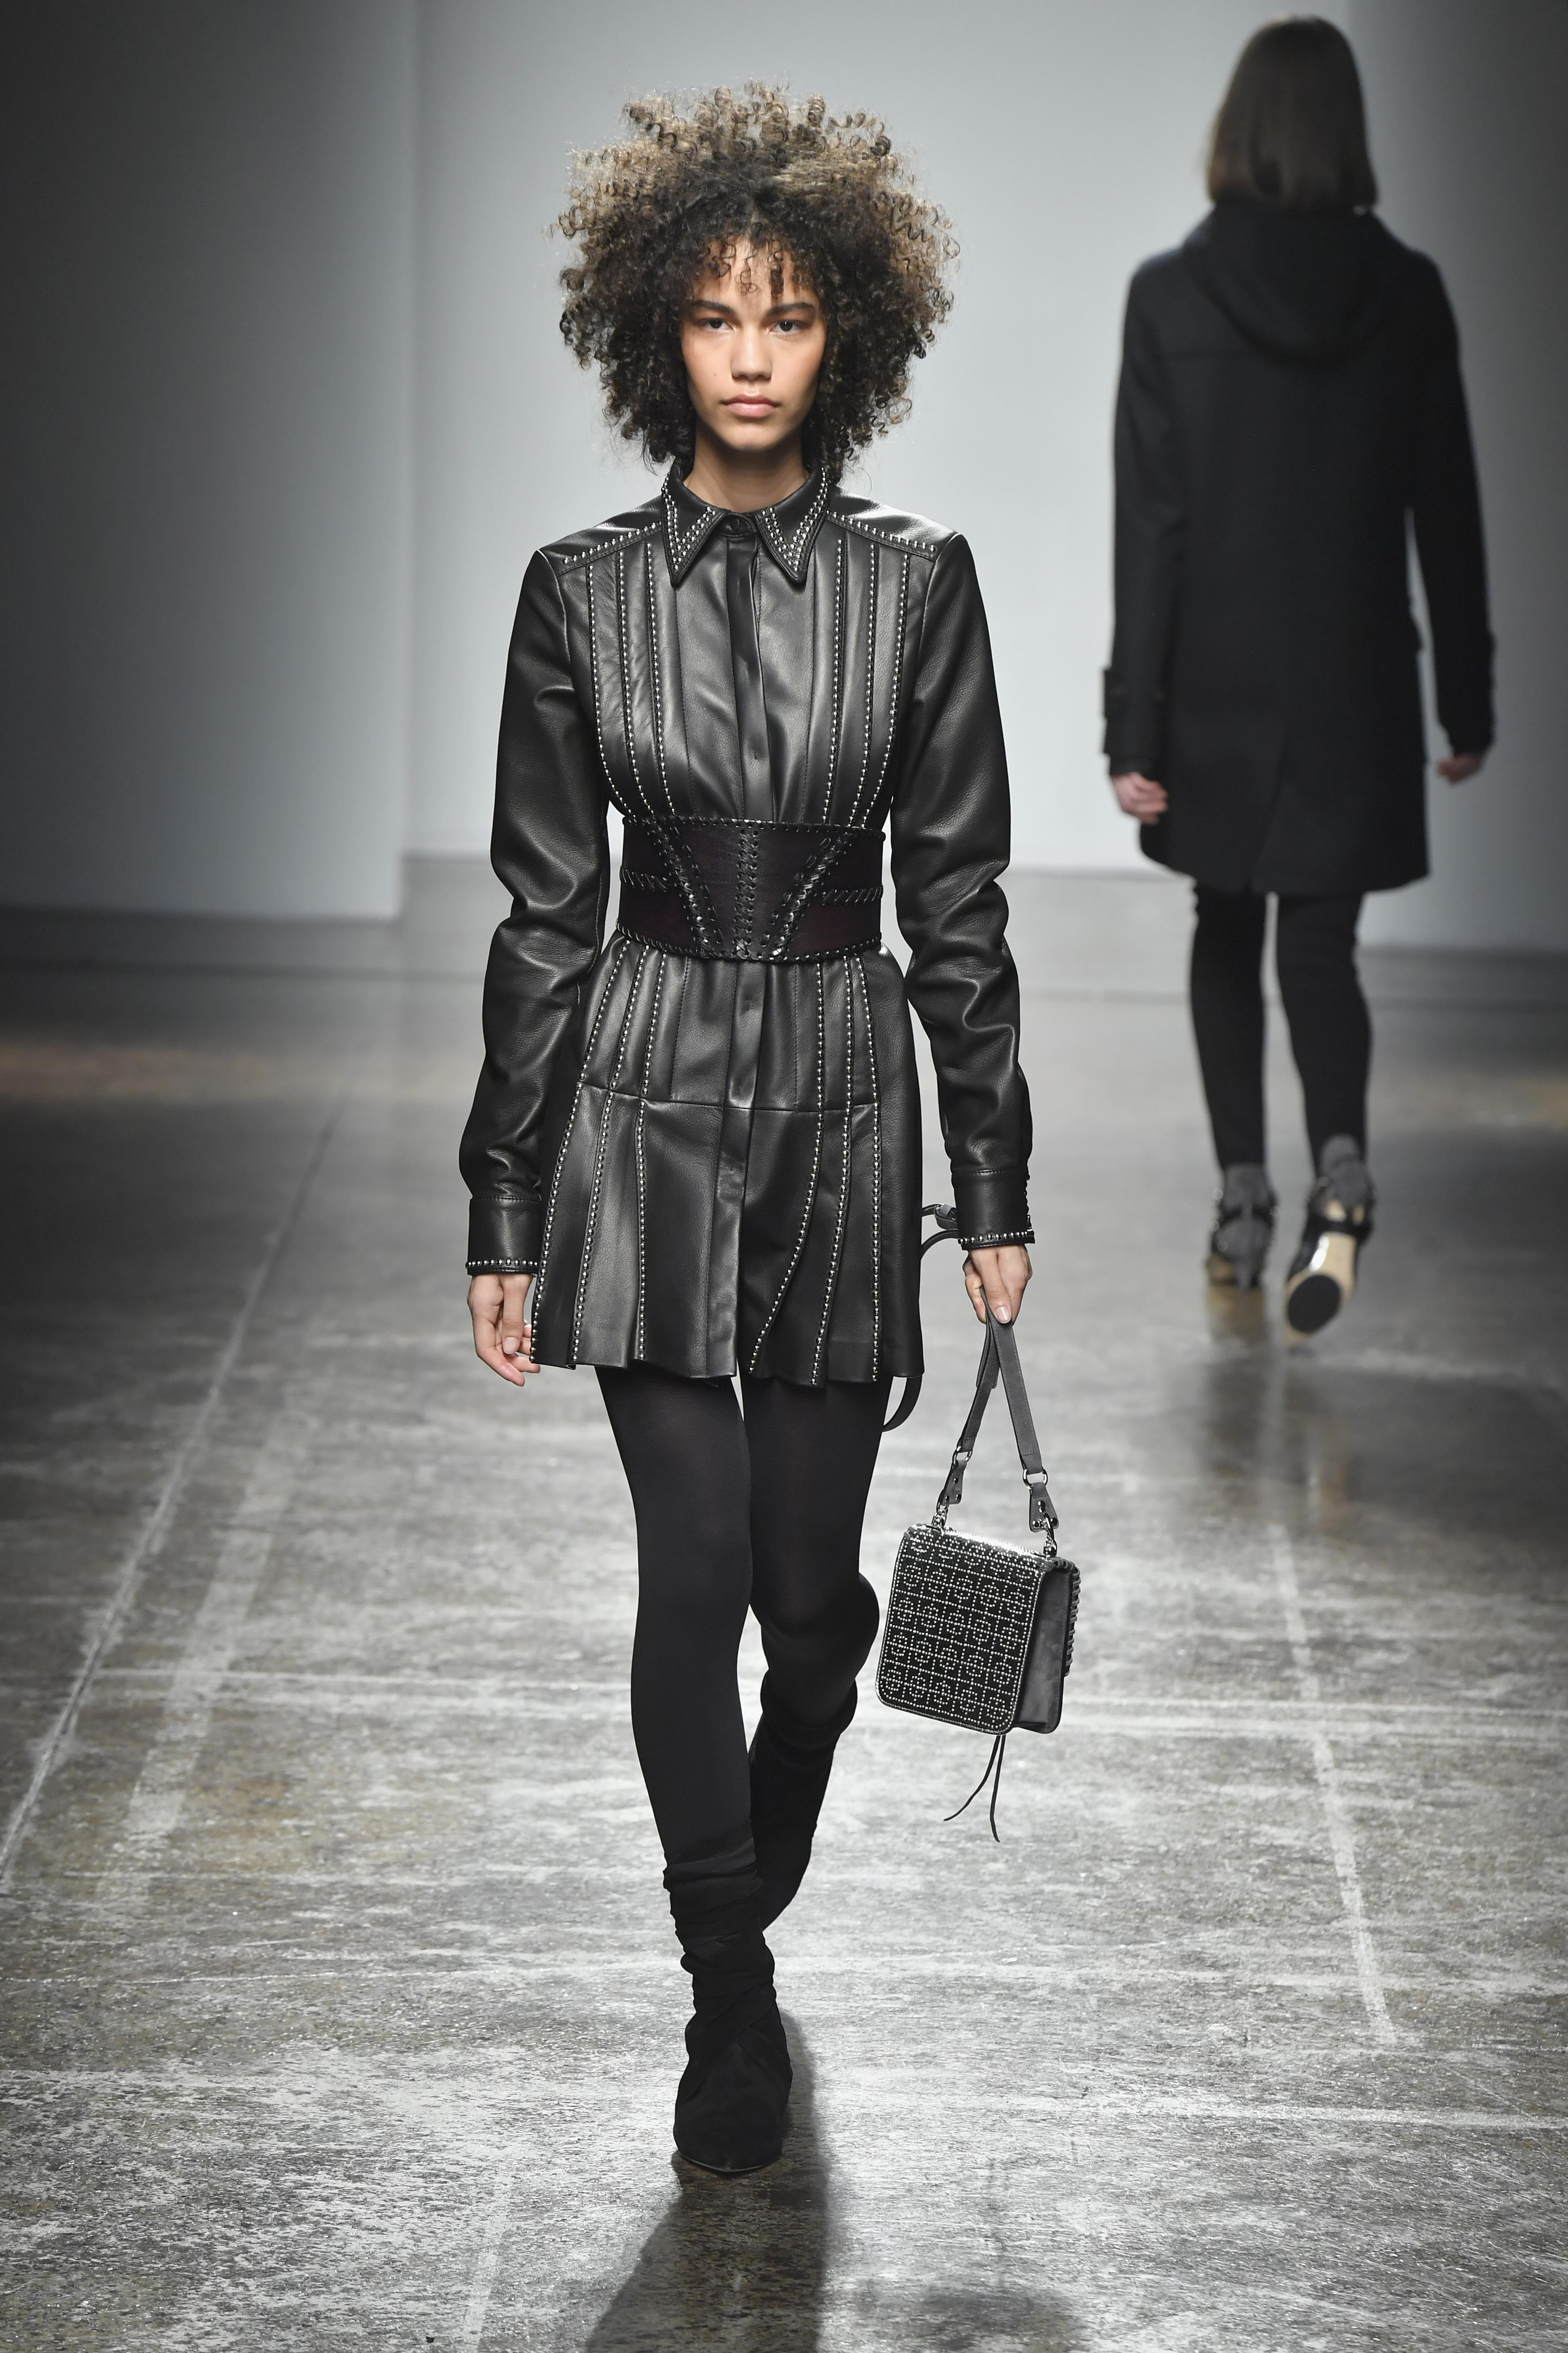 Fay - Runway - Milan Fashion Week Fall/Winter 2017/18